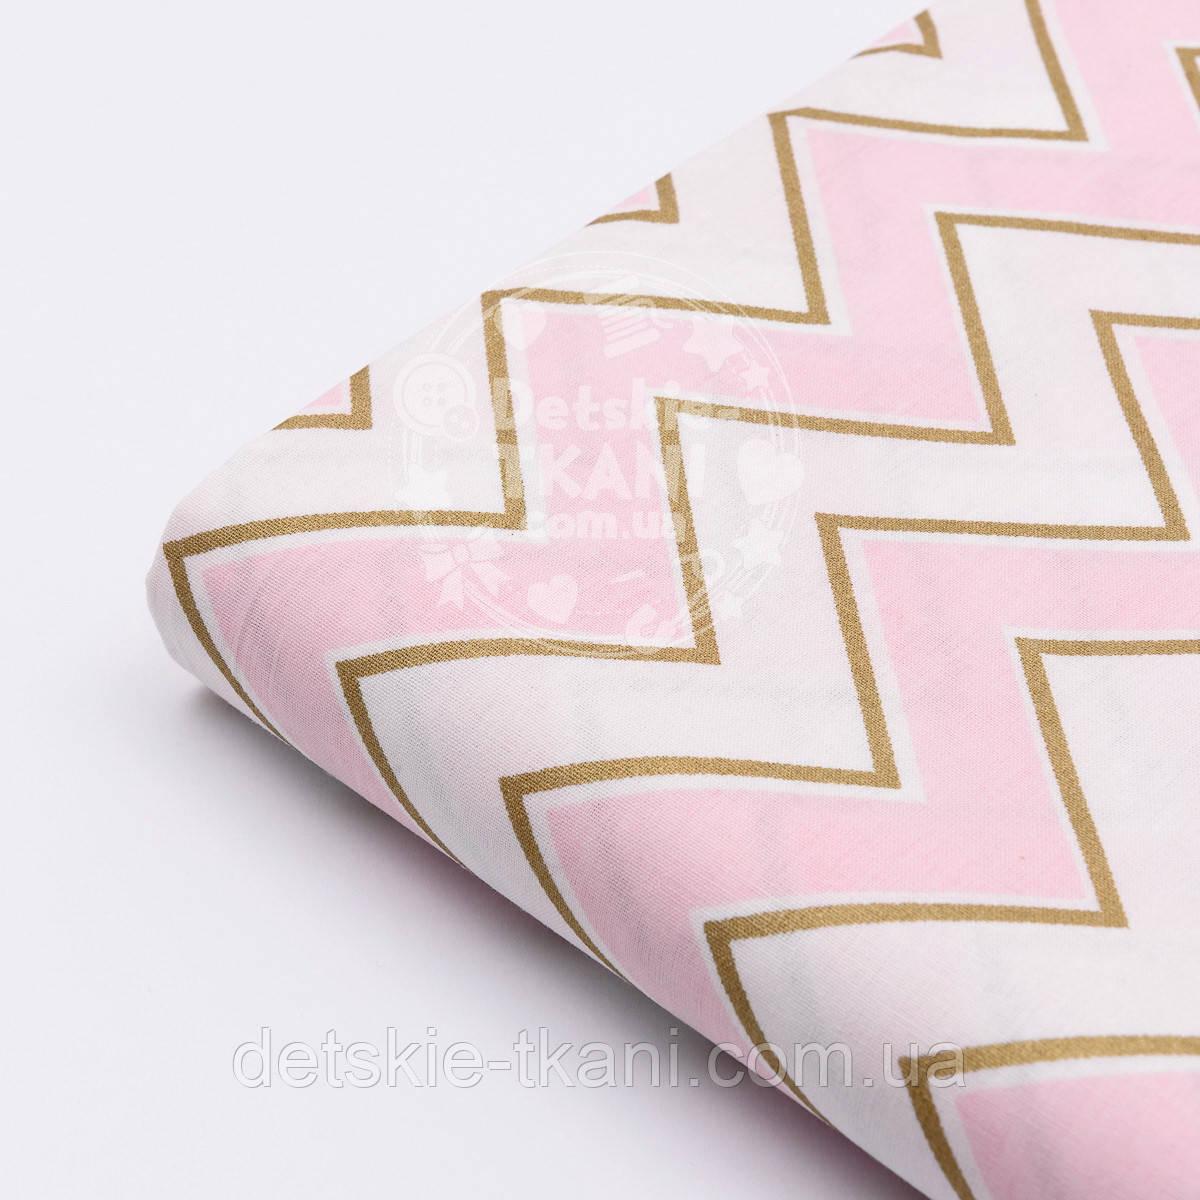 "Отрез ткани  ""Зигзаг розово-золотистый"" на белом №1566 размер 65*240"